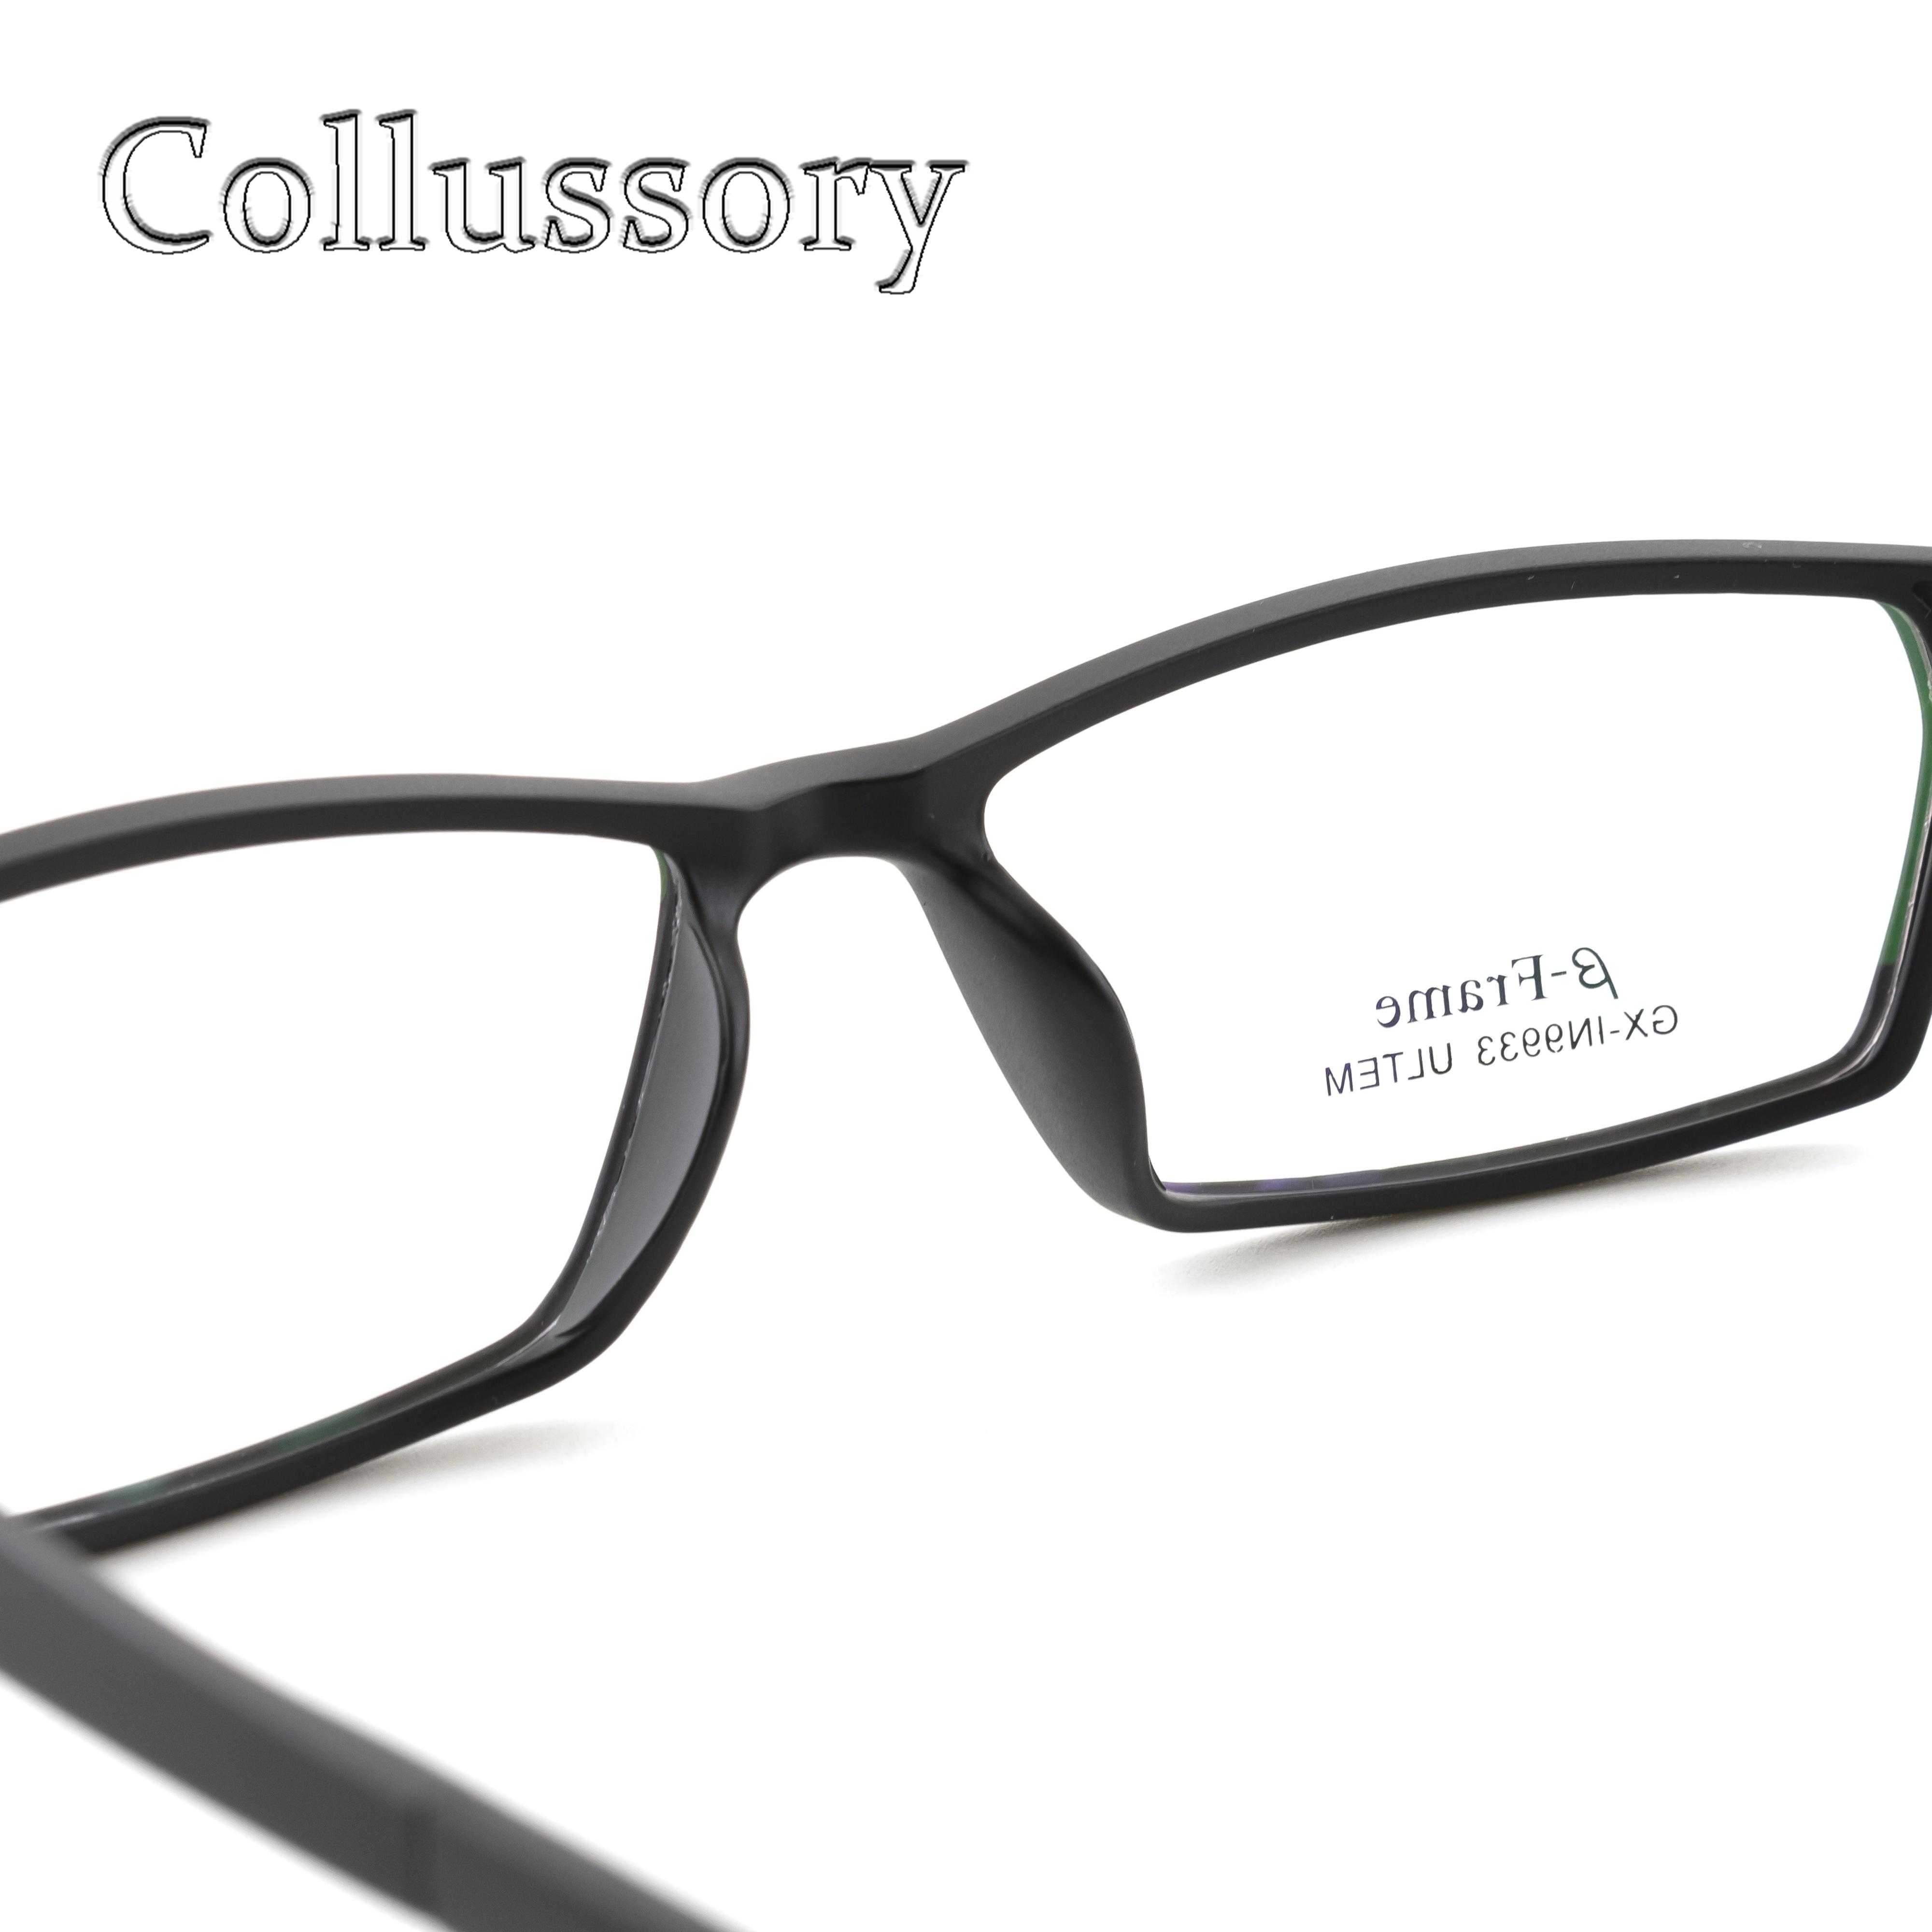 a311dda72eb8 Men Eyeglasses Frame Ultem Tungsten Optical Eyewear Sport Style Prescription  Reading Computer Goggles Flexible Light Top quality-in Eyewear Frames from  ...